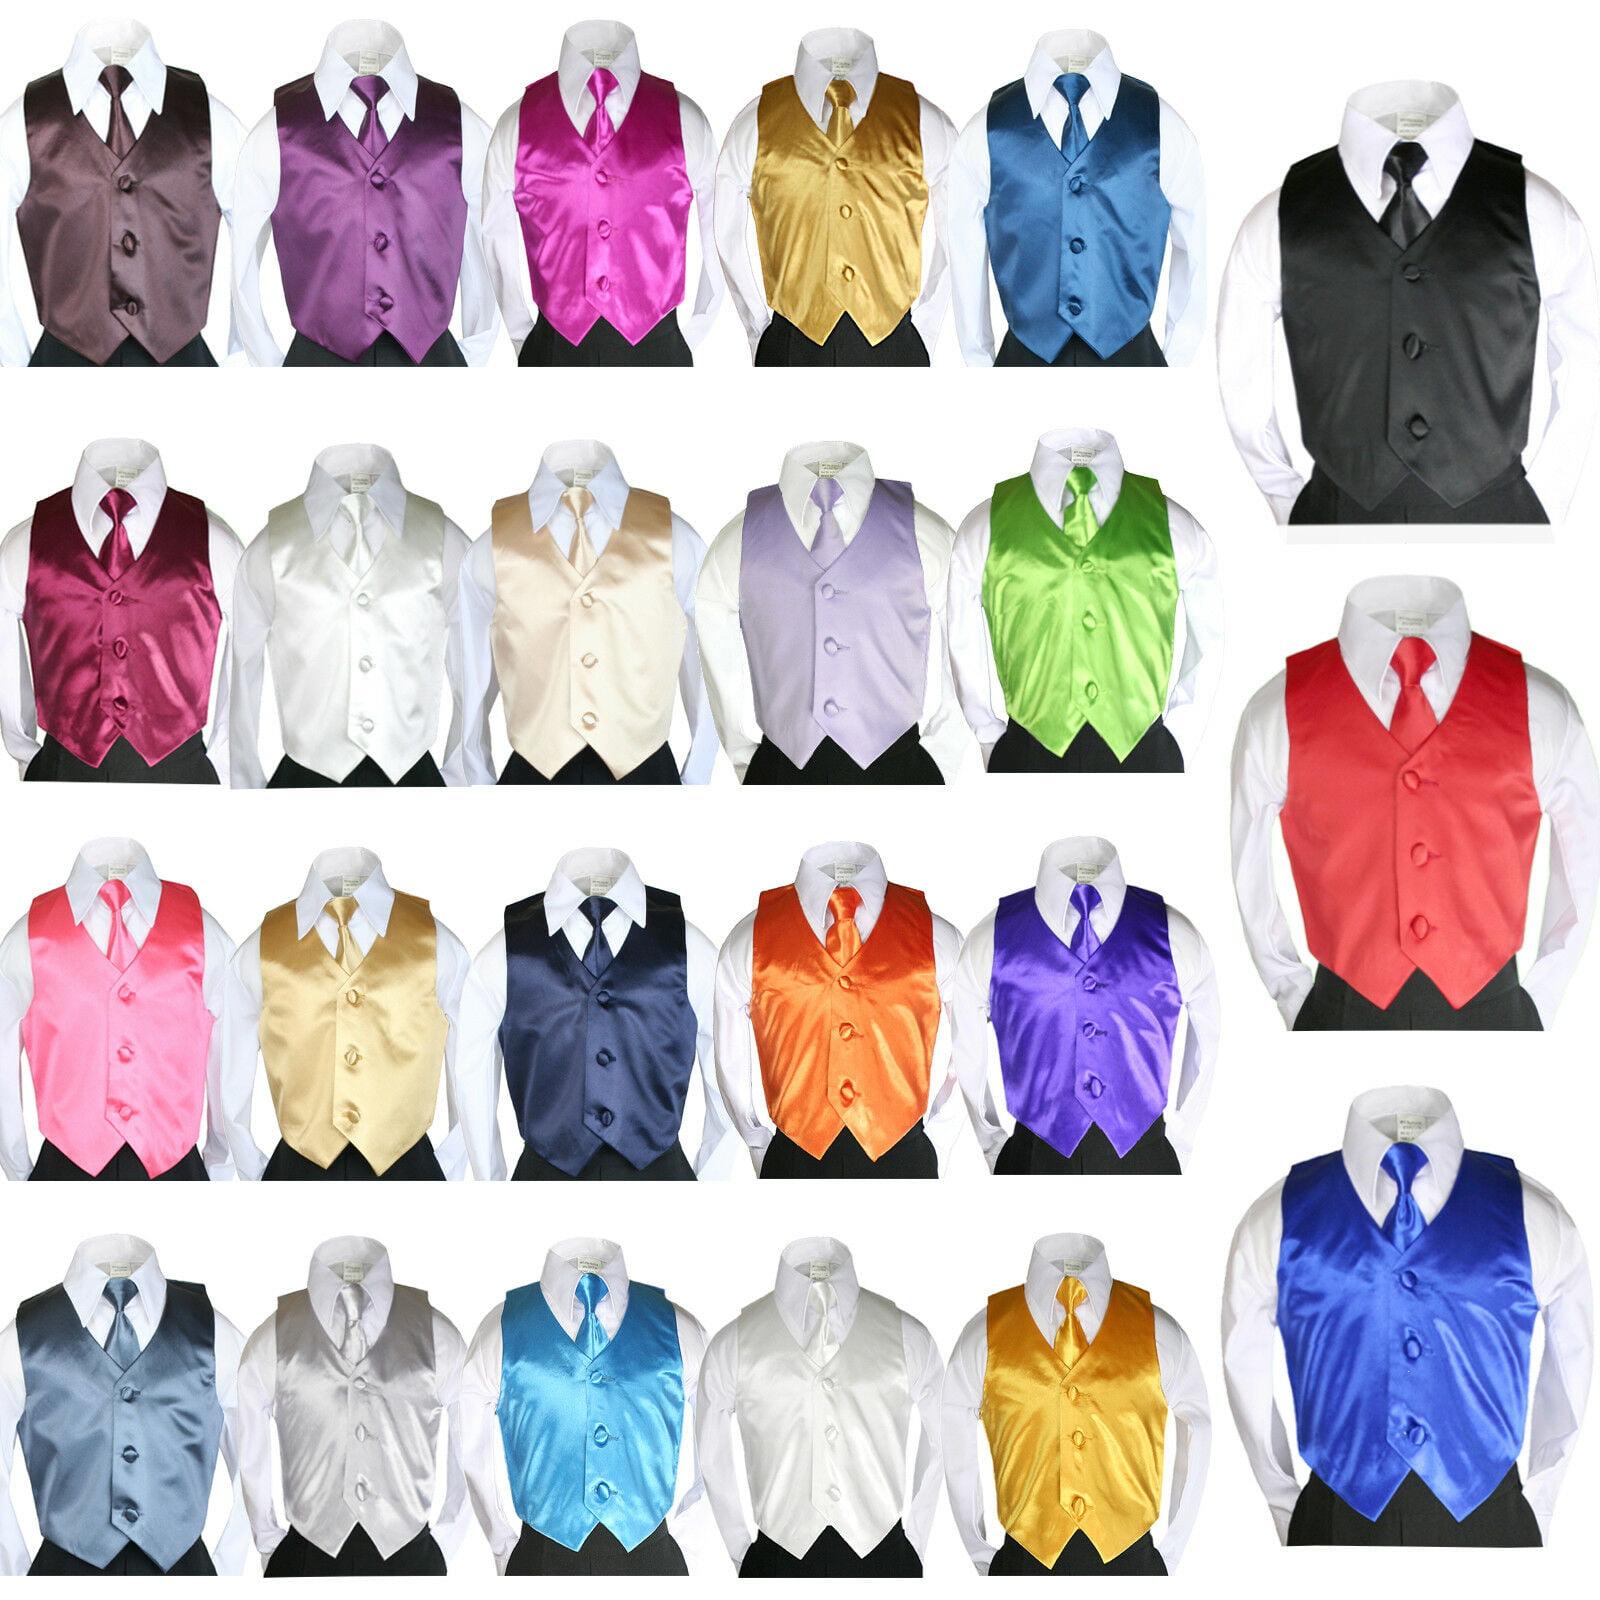 MILLTEX 4 Pieces Formal Party Wedding Color Satin Necktie Shirt W//Hat White Shorts Set New Born Baby Boy Toddler Sm-4T